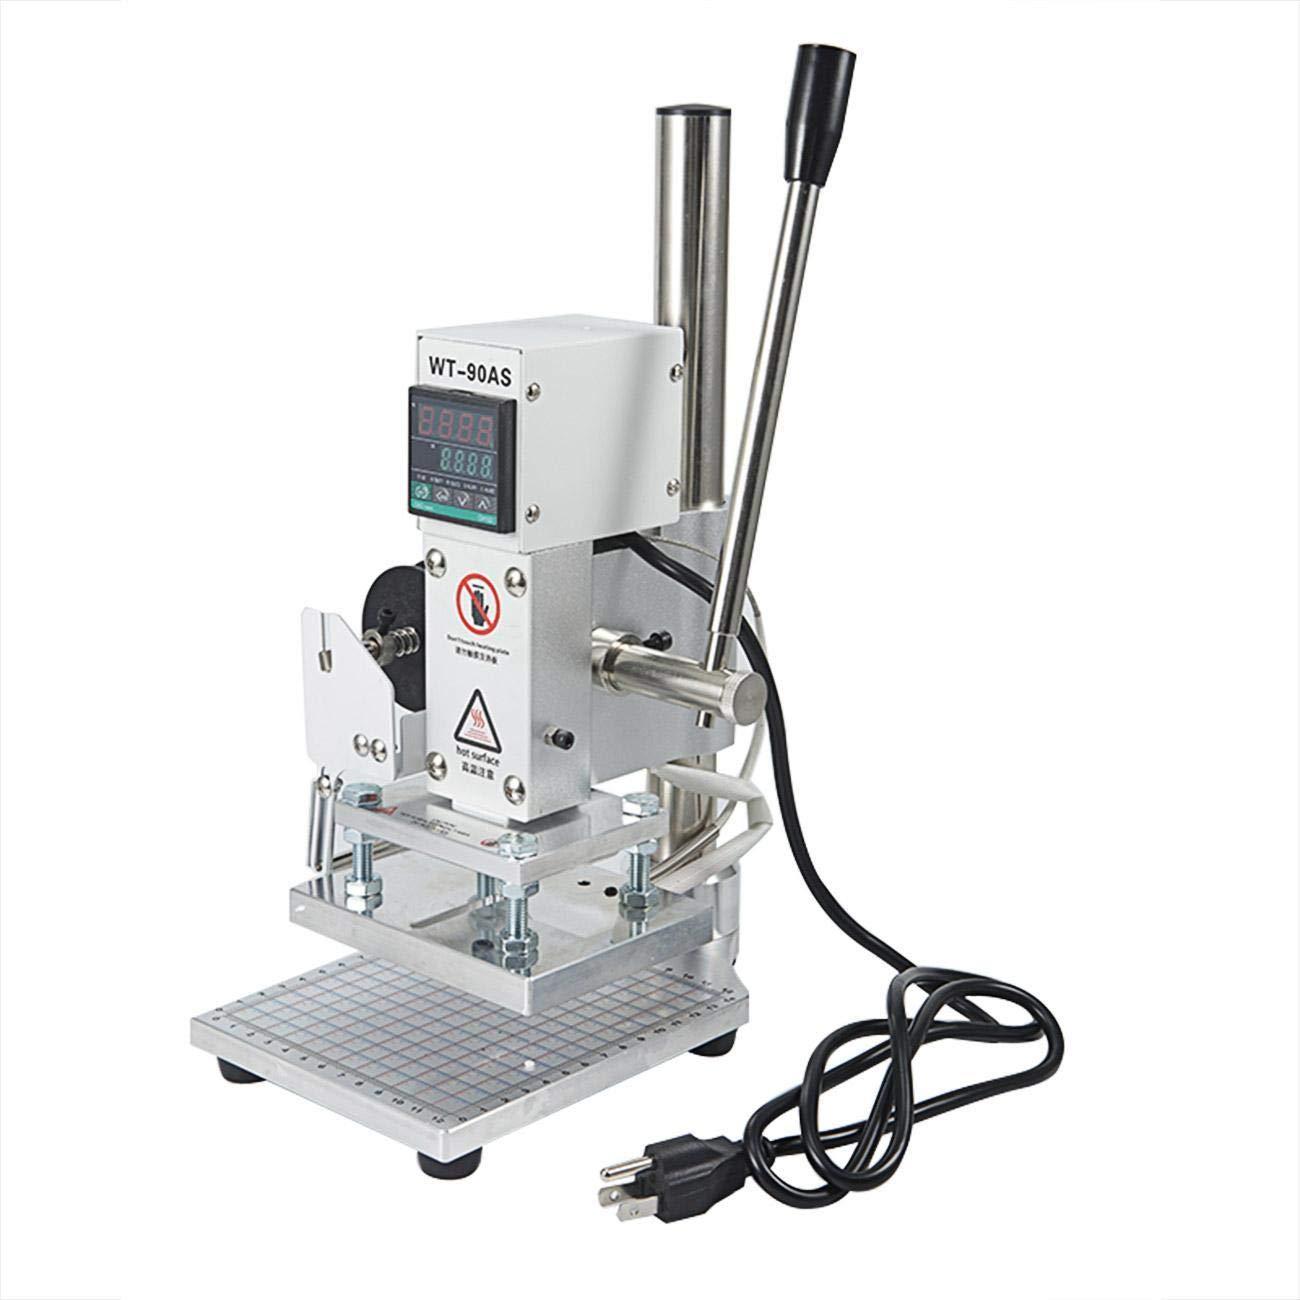 BEAMNOVA Hot Foil Stamping Machine 10 x 13 cm Manual Logo Printer Stamper Bronzing Machine Markers